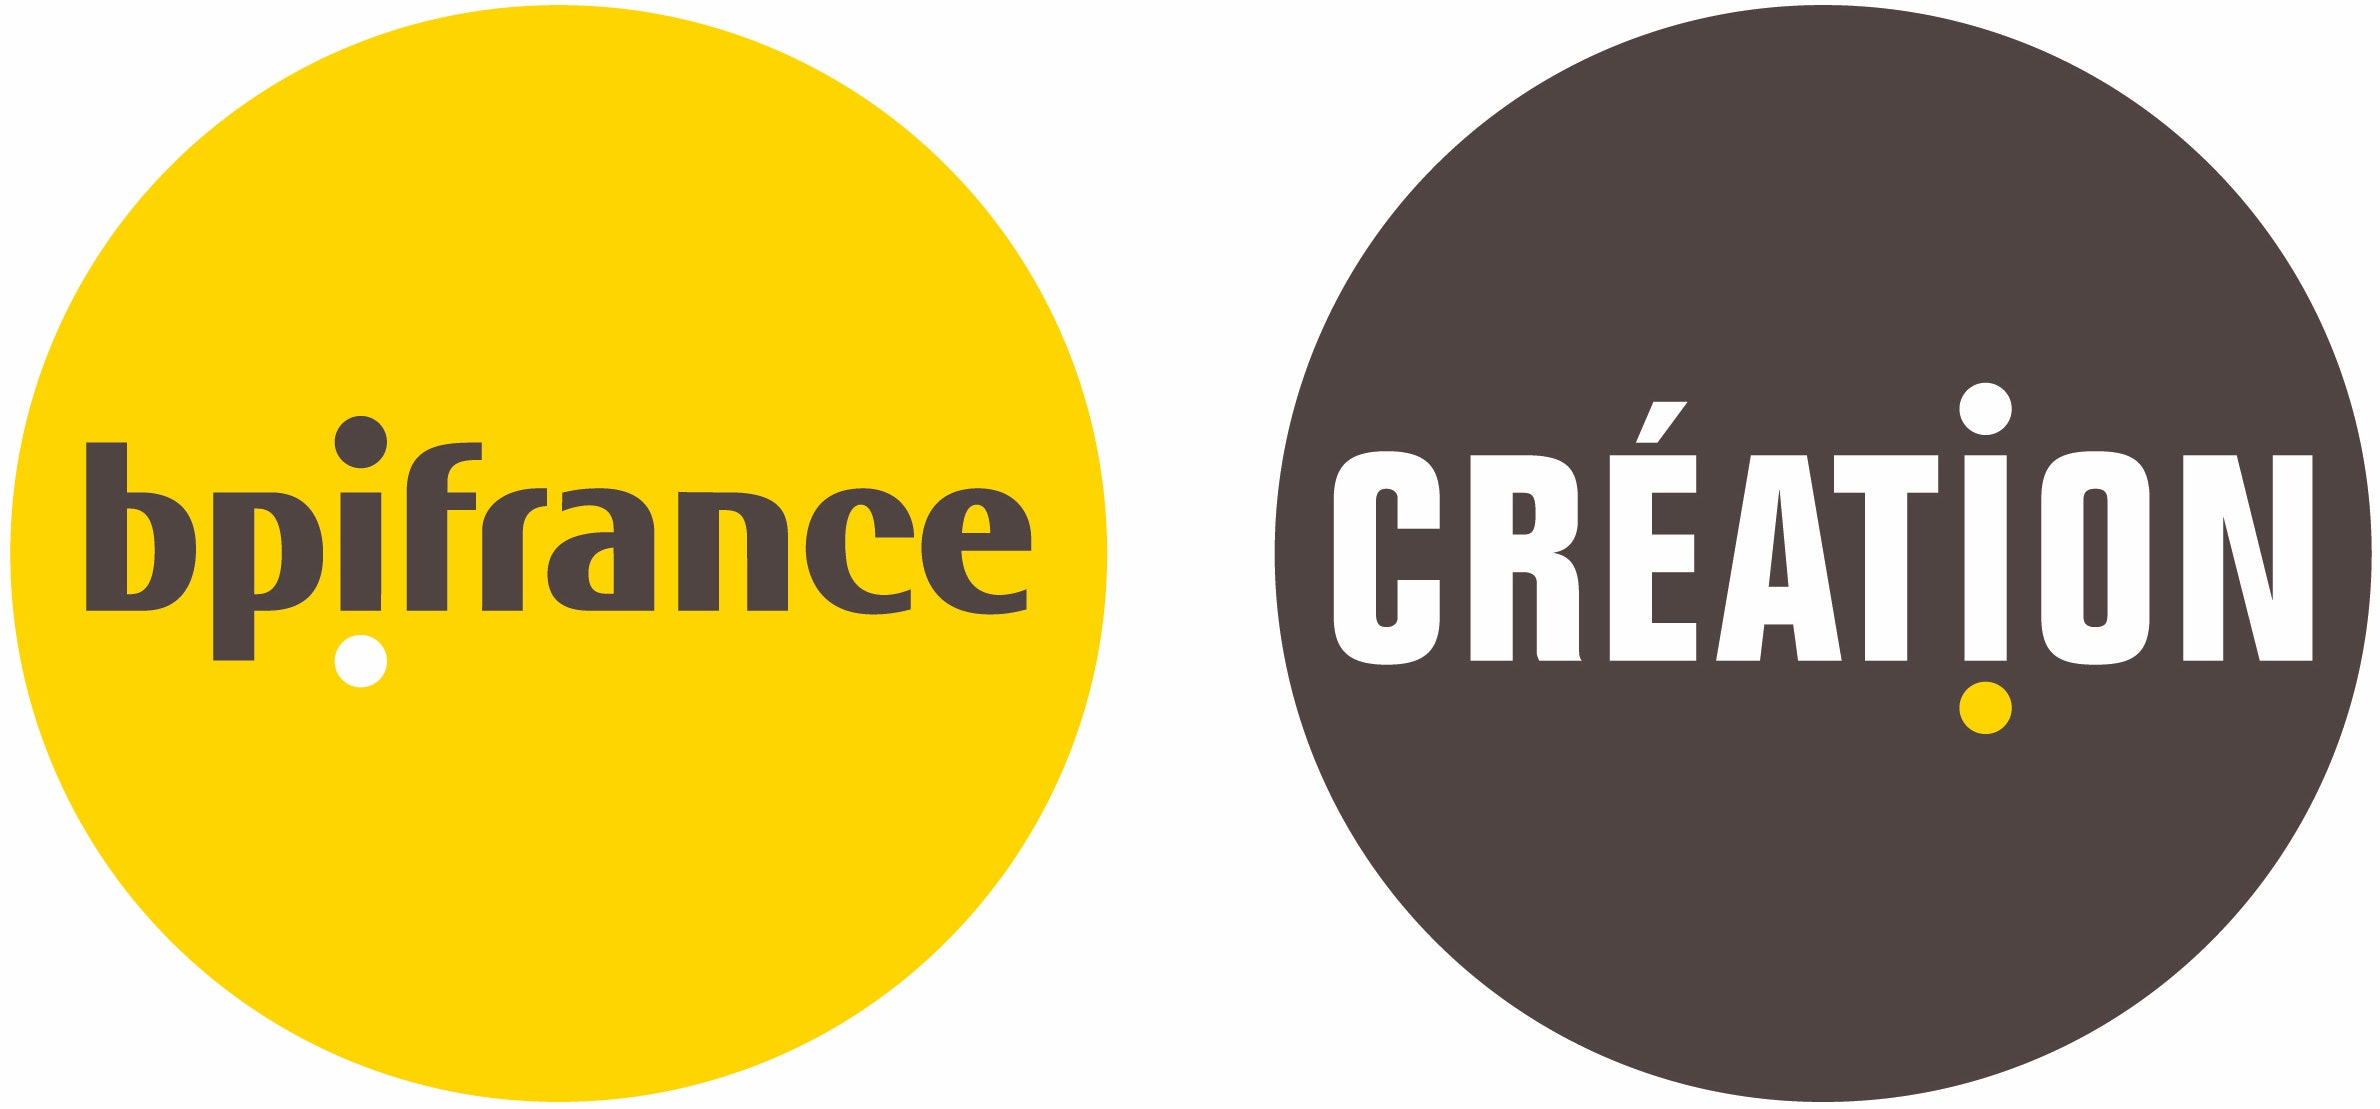 001 BPI FRANCE CREATION